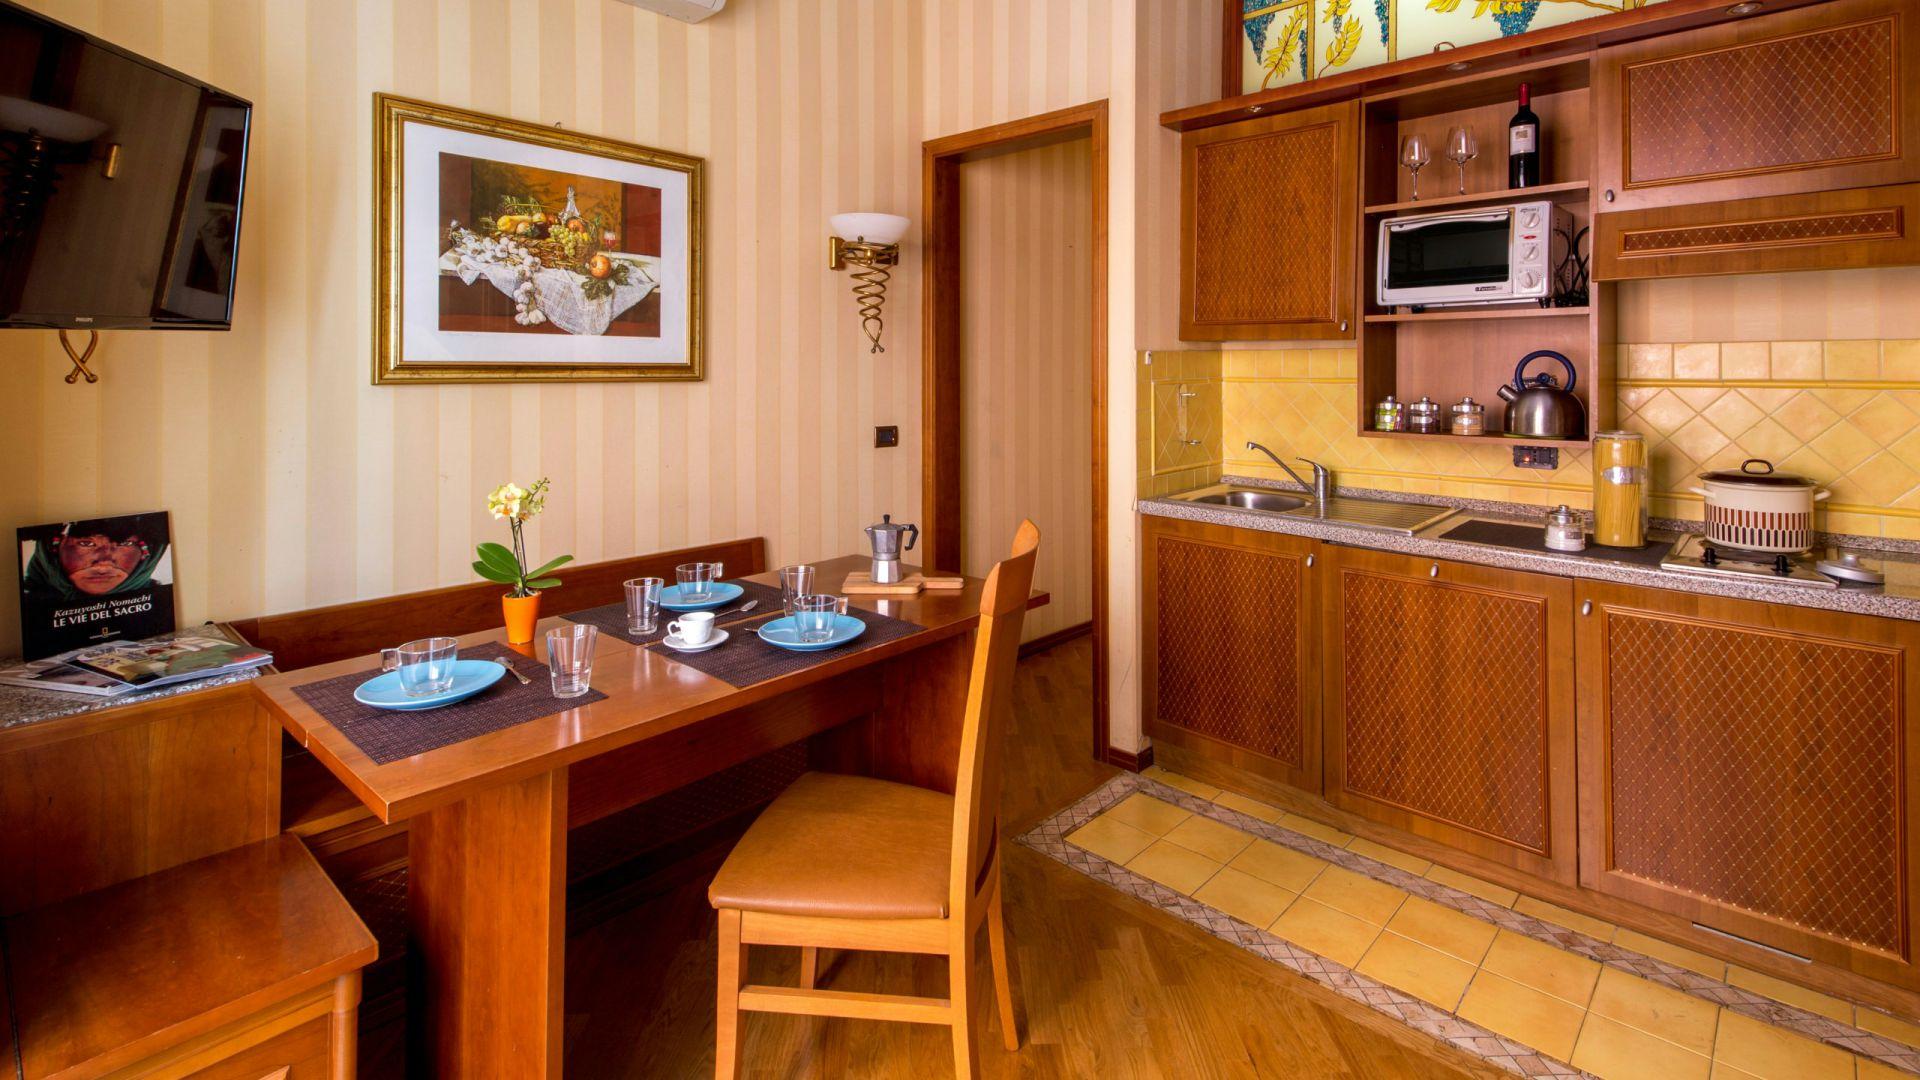 Foto-Hotel-Oxford-Roma-cozinha-apartamento-1